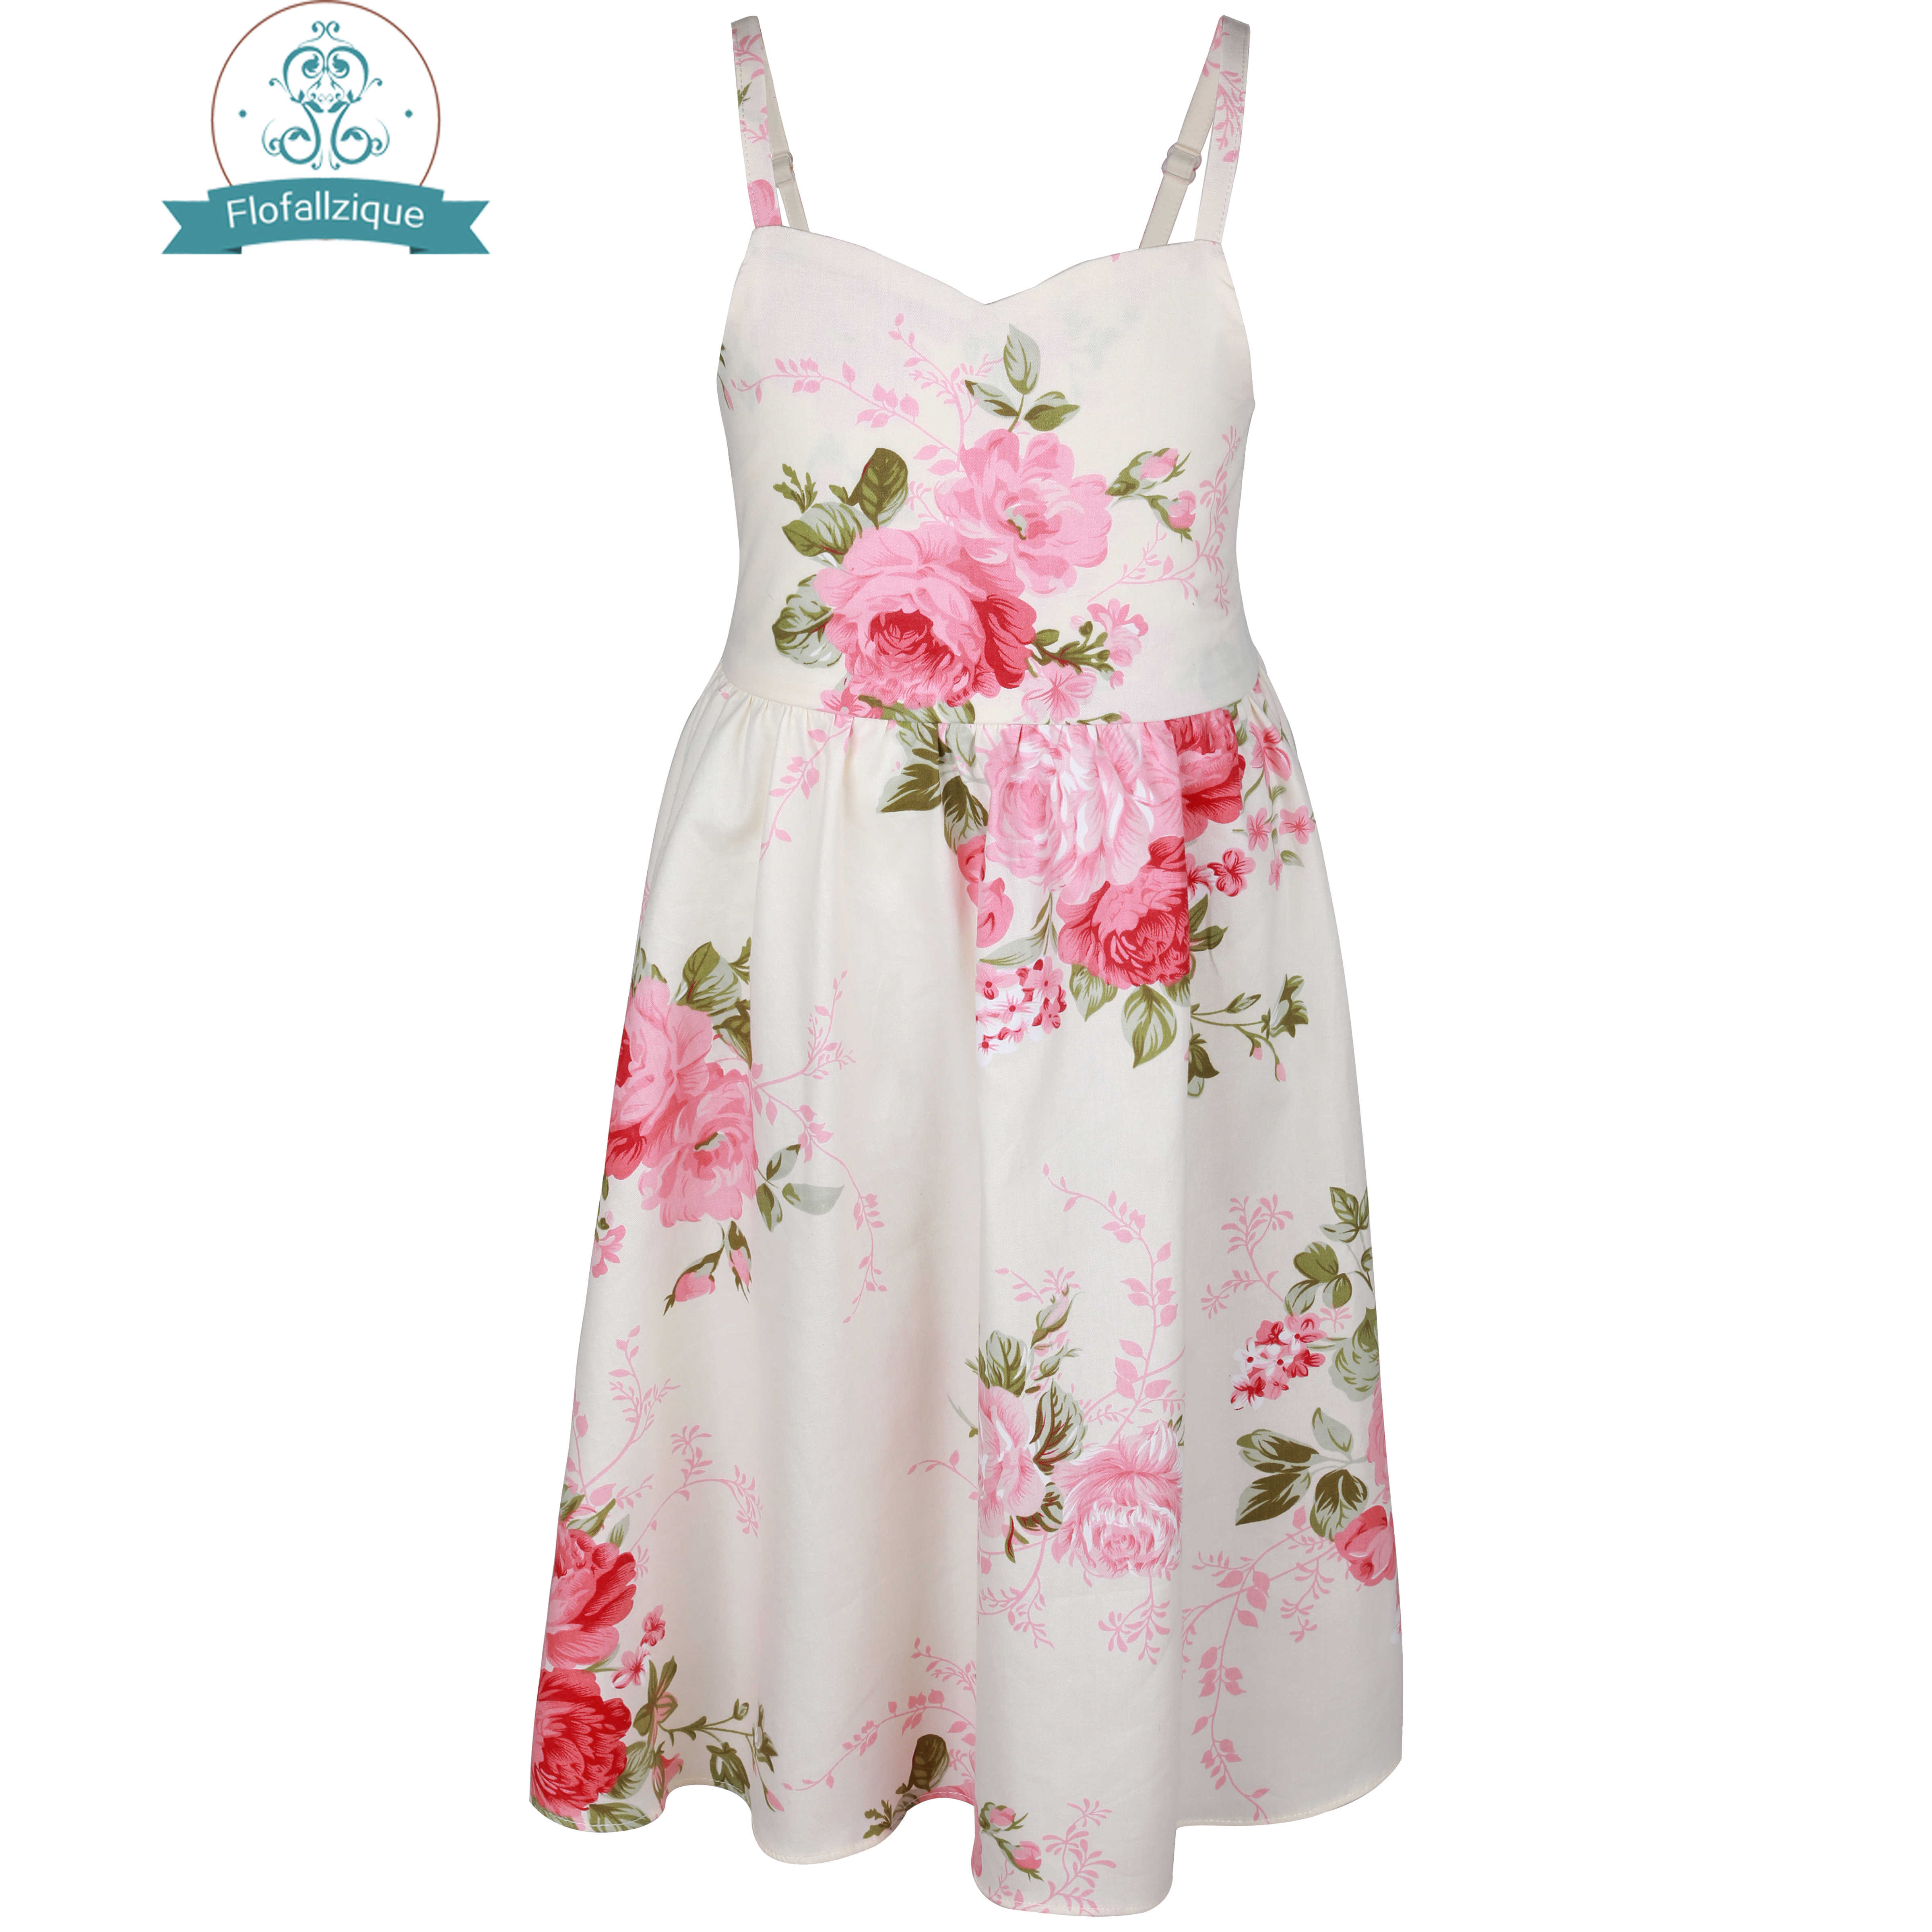 3b7128e43 Flofallzique Toddler Girls Tulle Christmas Dress Summer Vintage Floral  Party Princess kids dresses for girls clothes